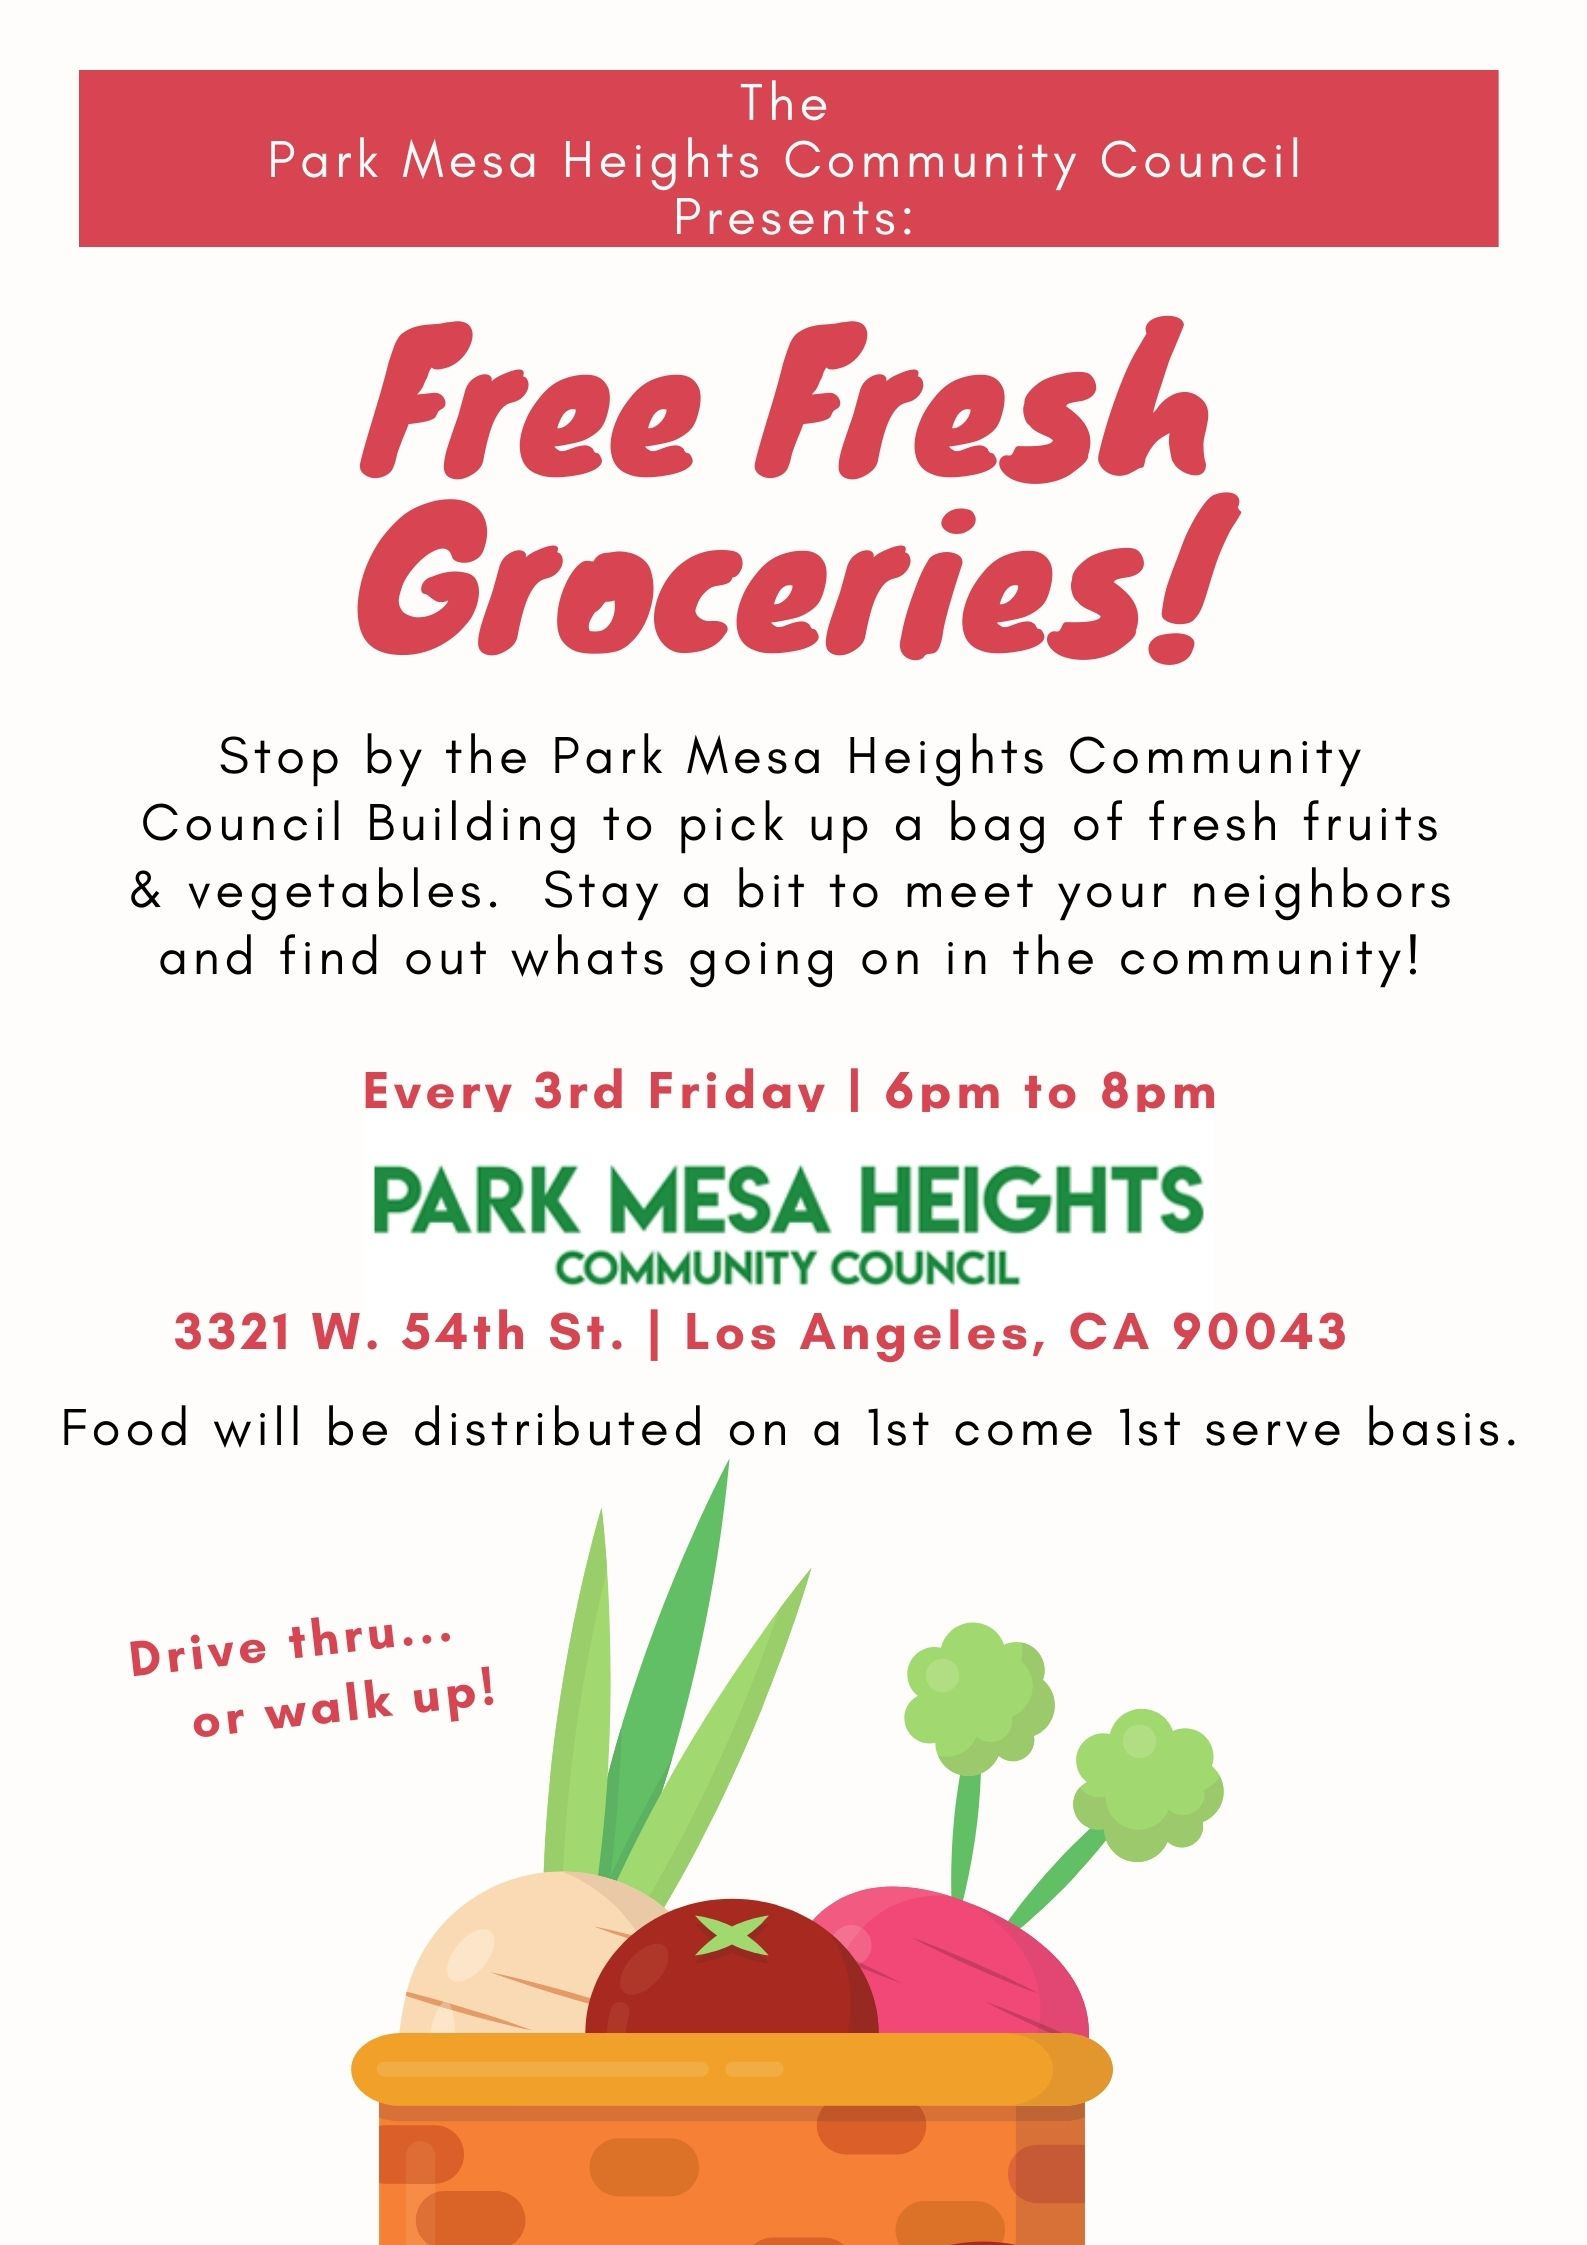 Free fresh groceries